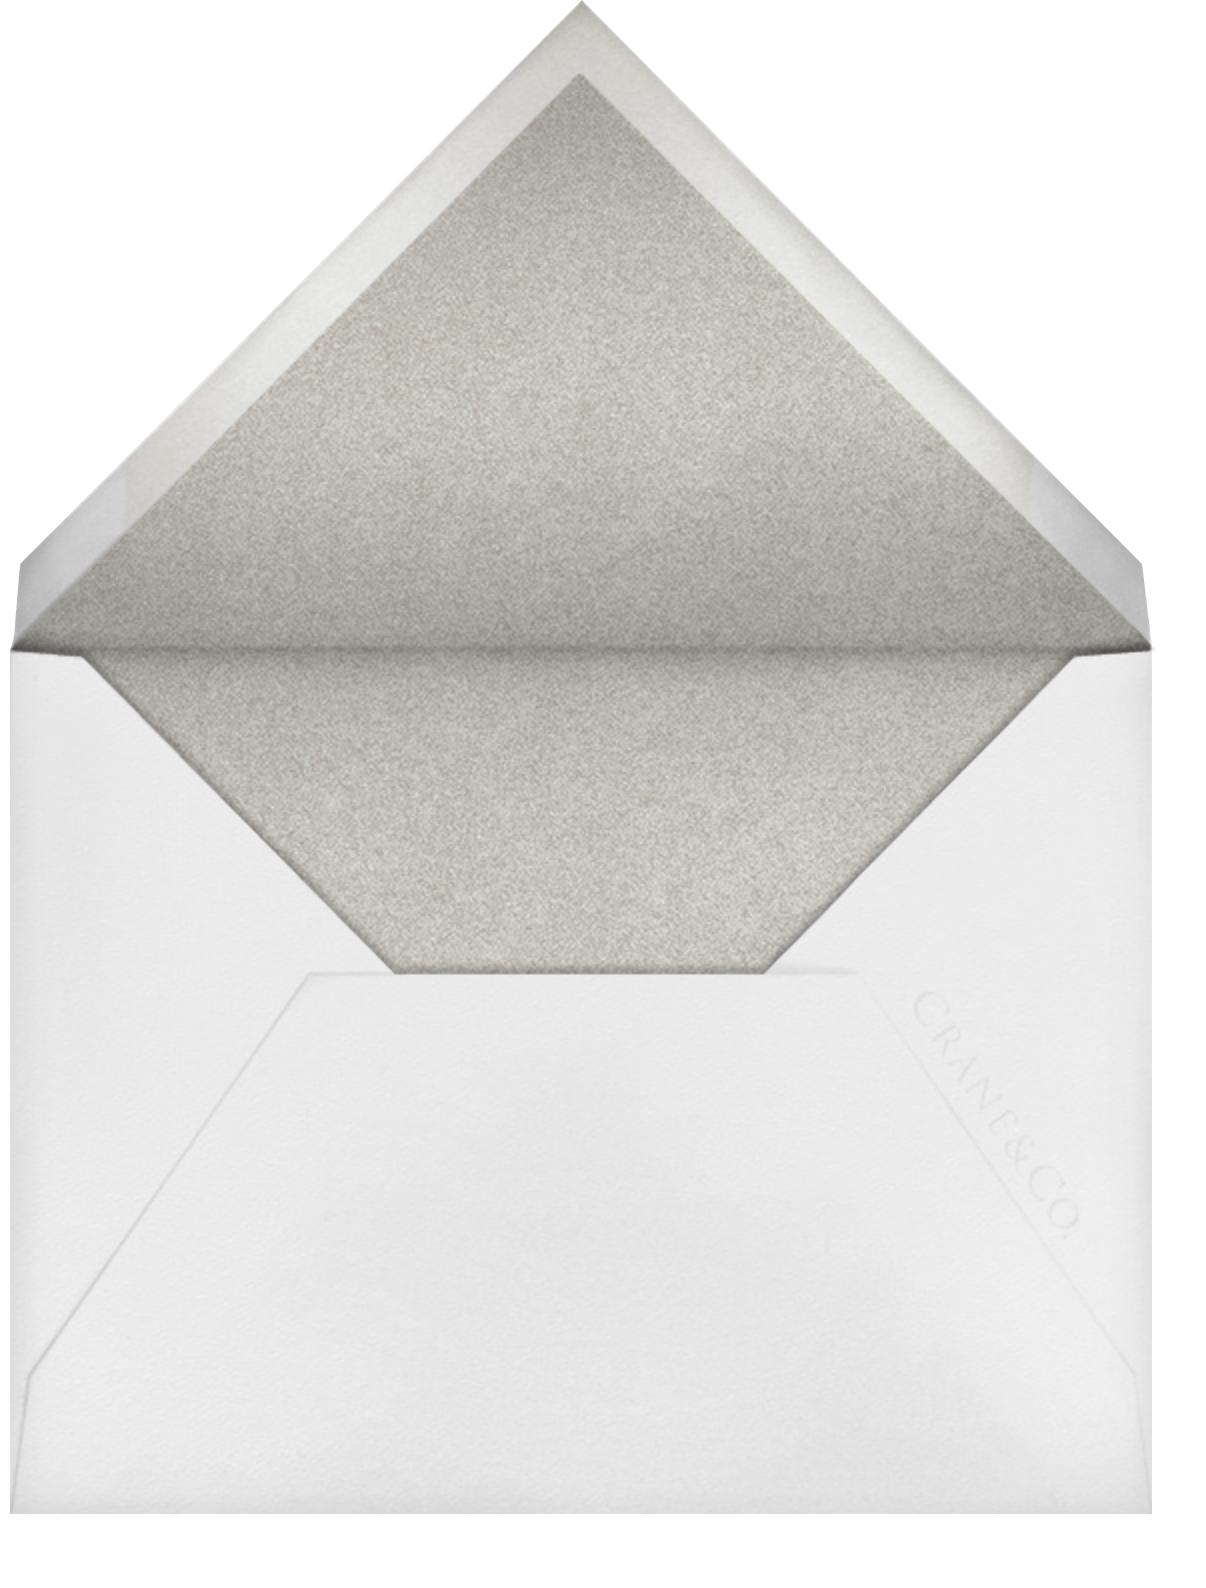 Polka Dot - Platinum - Oscar de la Renta - All - envelope back